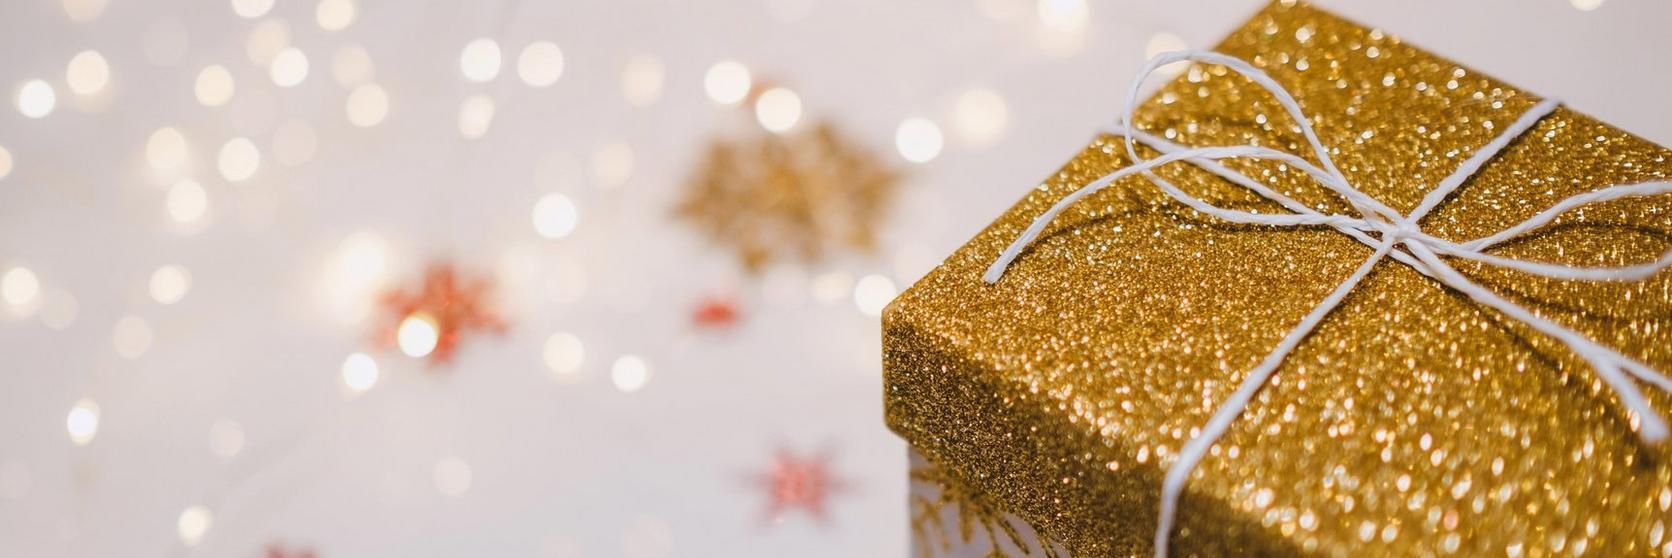 christmas-glitter-present